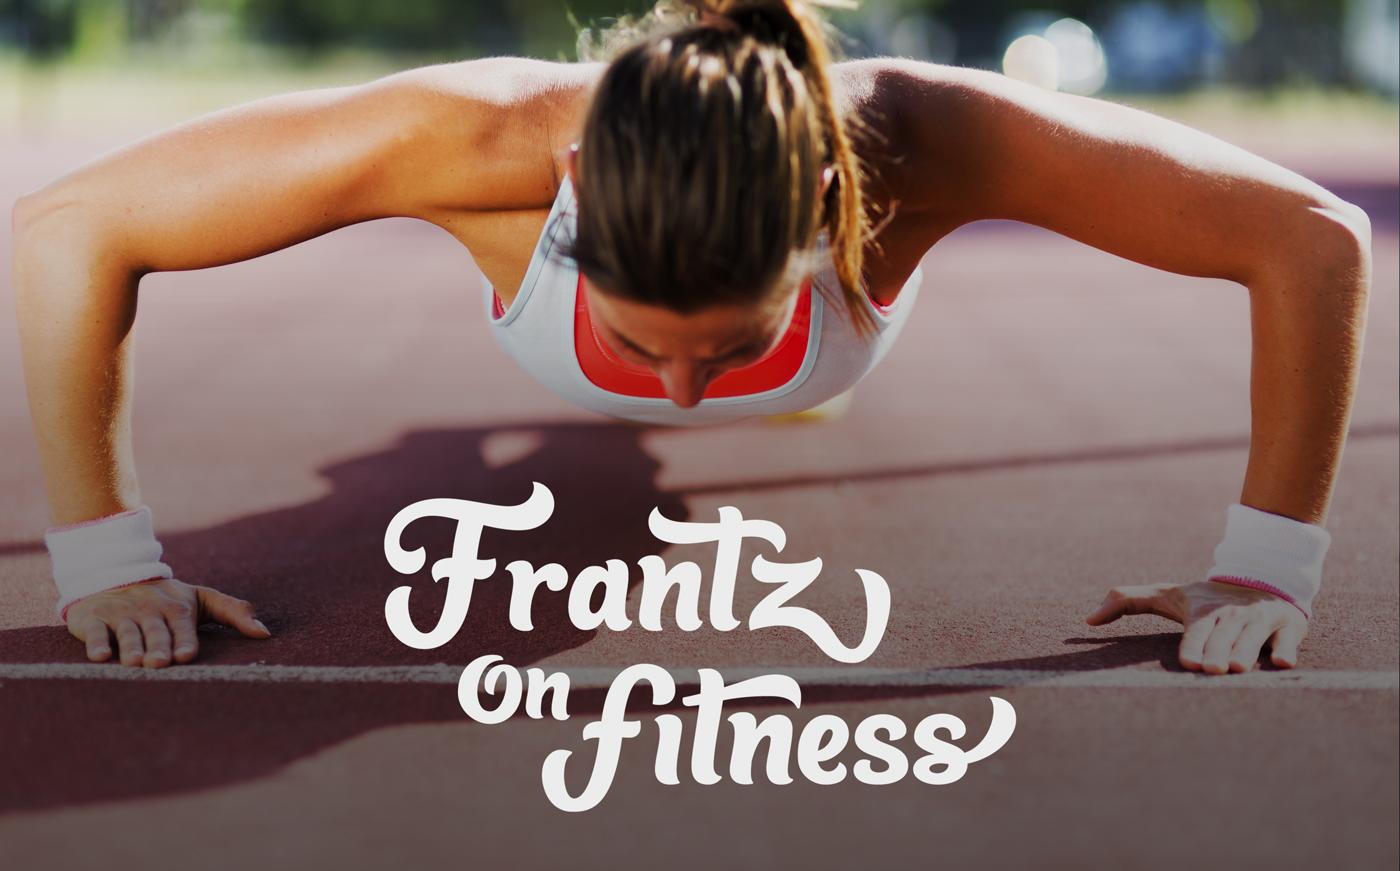 frantz-on-fitness-logo-design-lettering-leo-gomez-studio-12